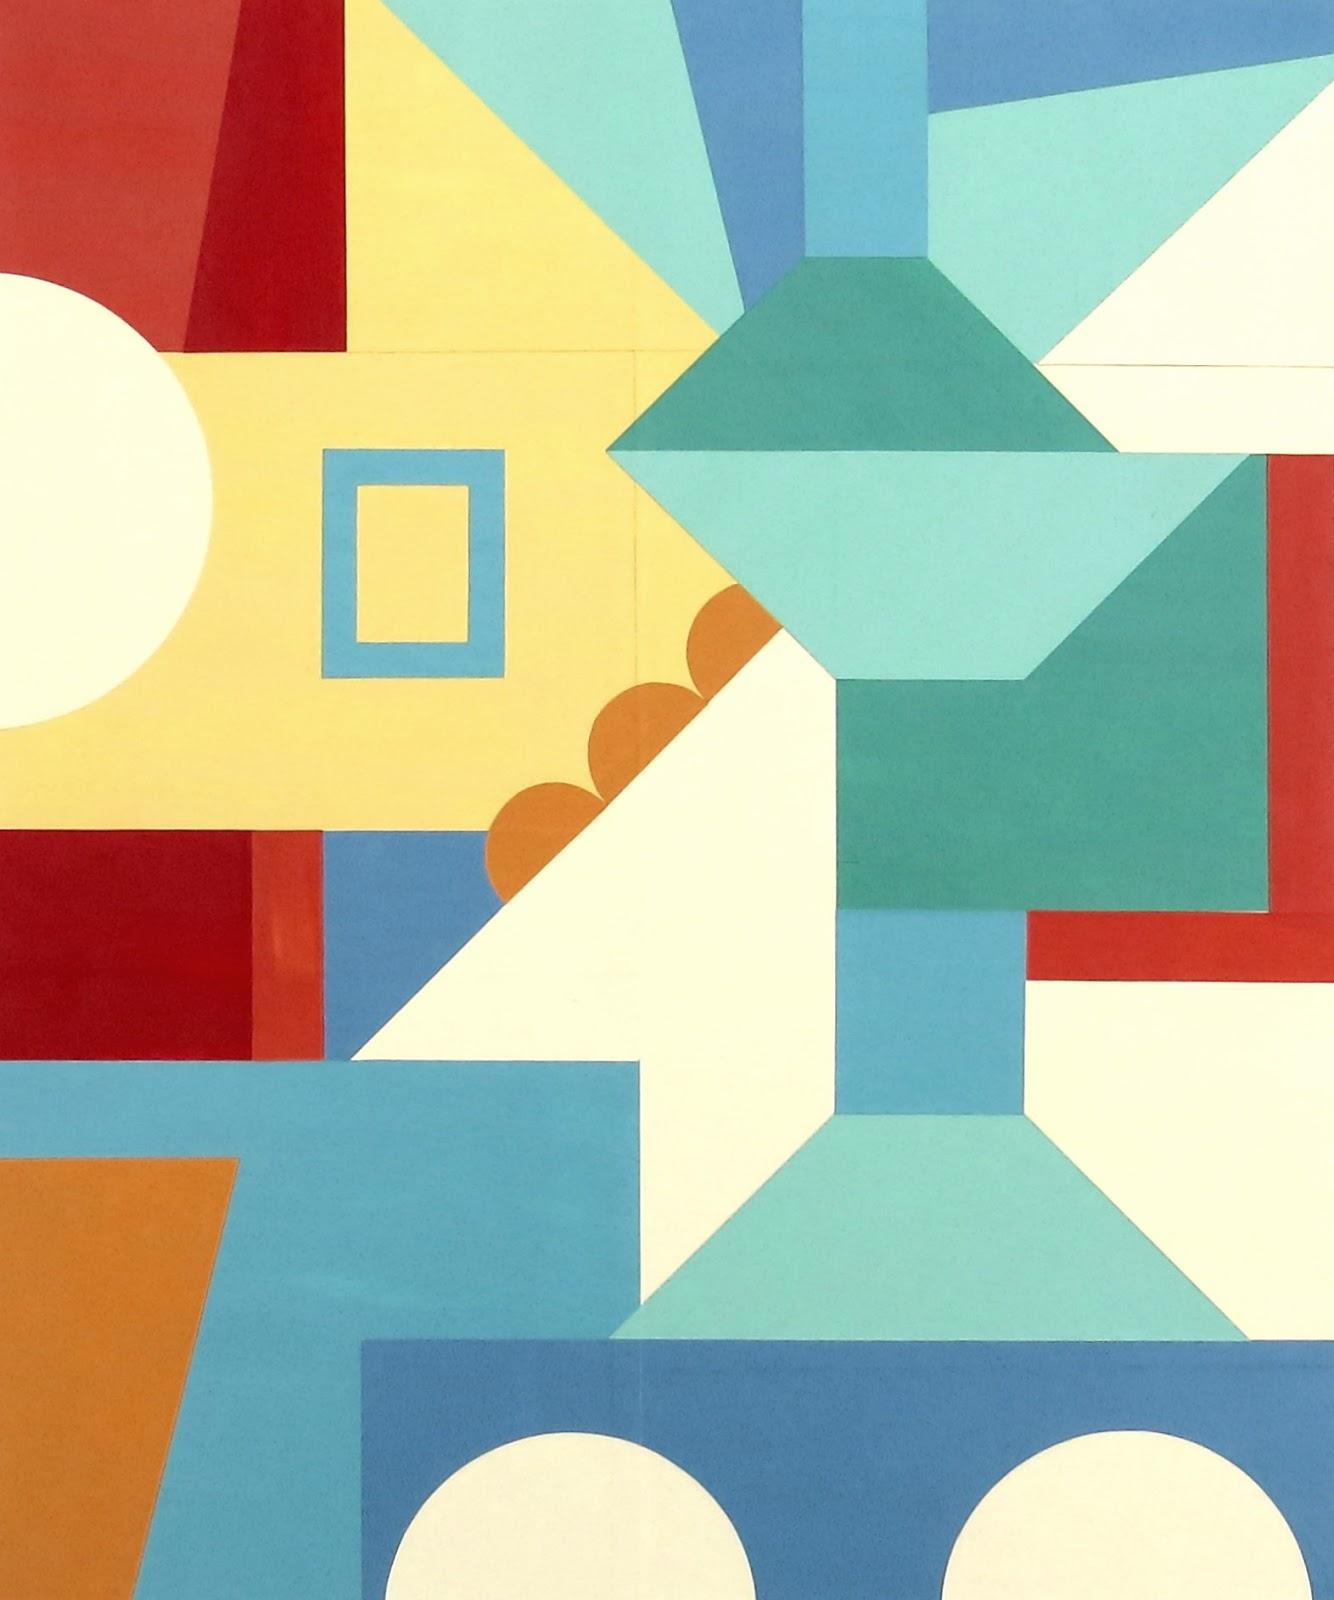 Libby Fife Fine Art-Studio Blog: New Work: That Thing You Do